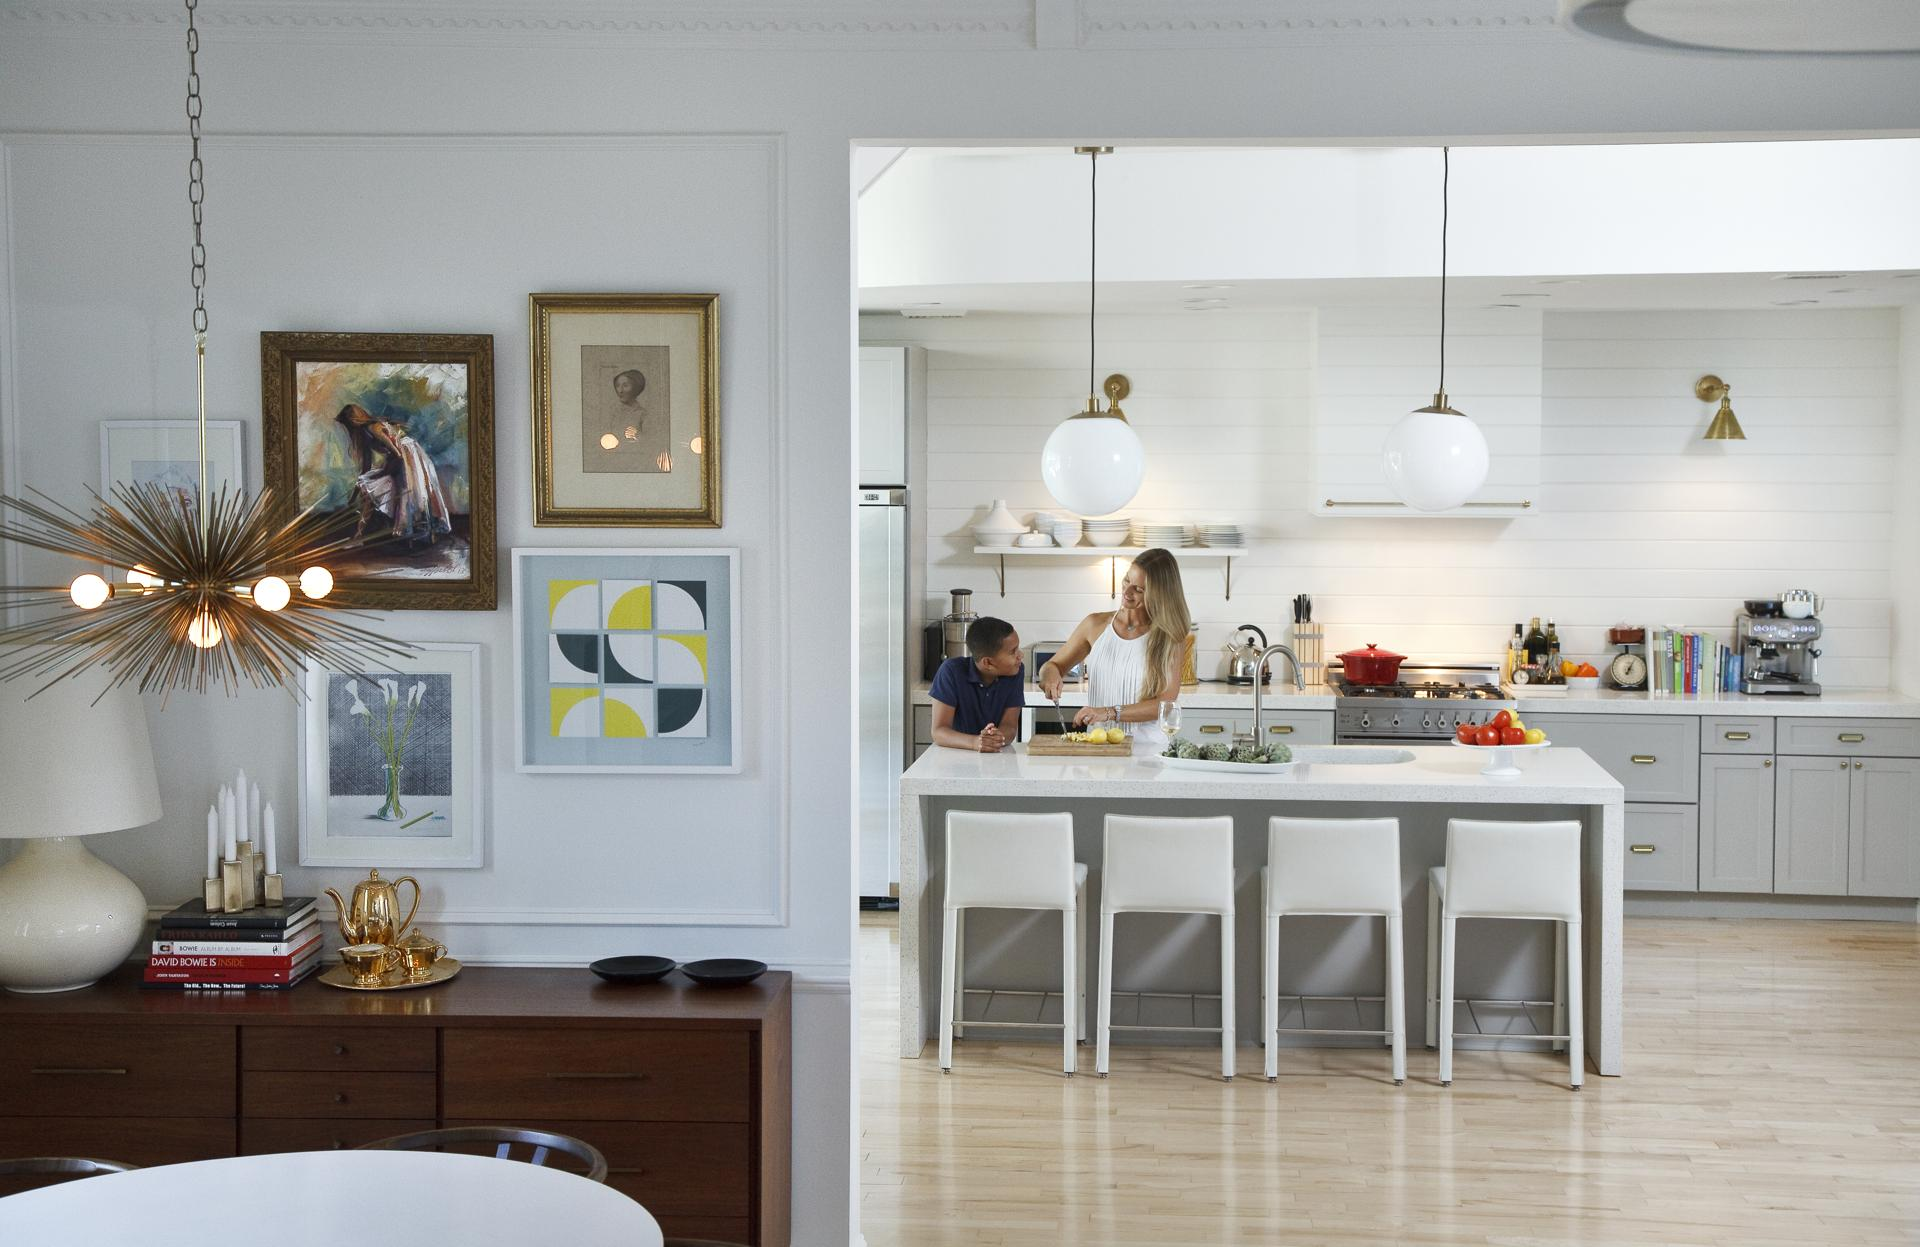 Fixer upper carriage house kitchen - 8 19 2015 Dorchester Ma For Magazine Melissa Miranda